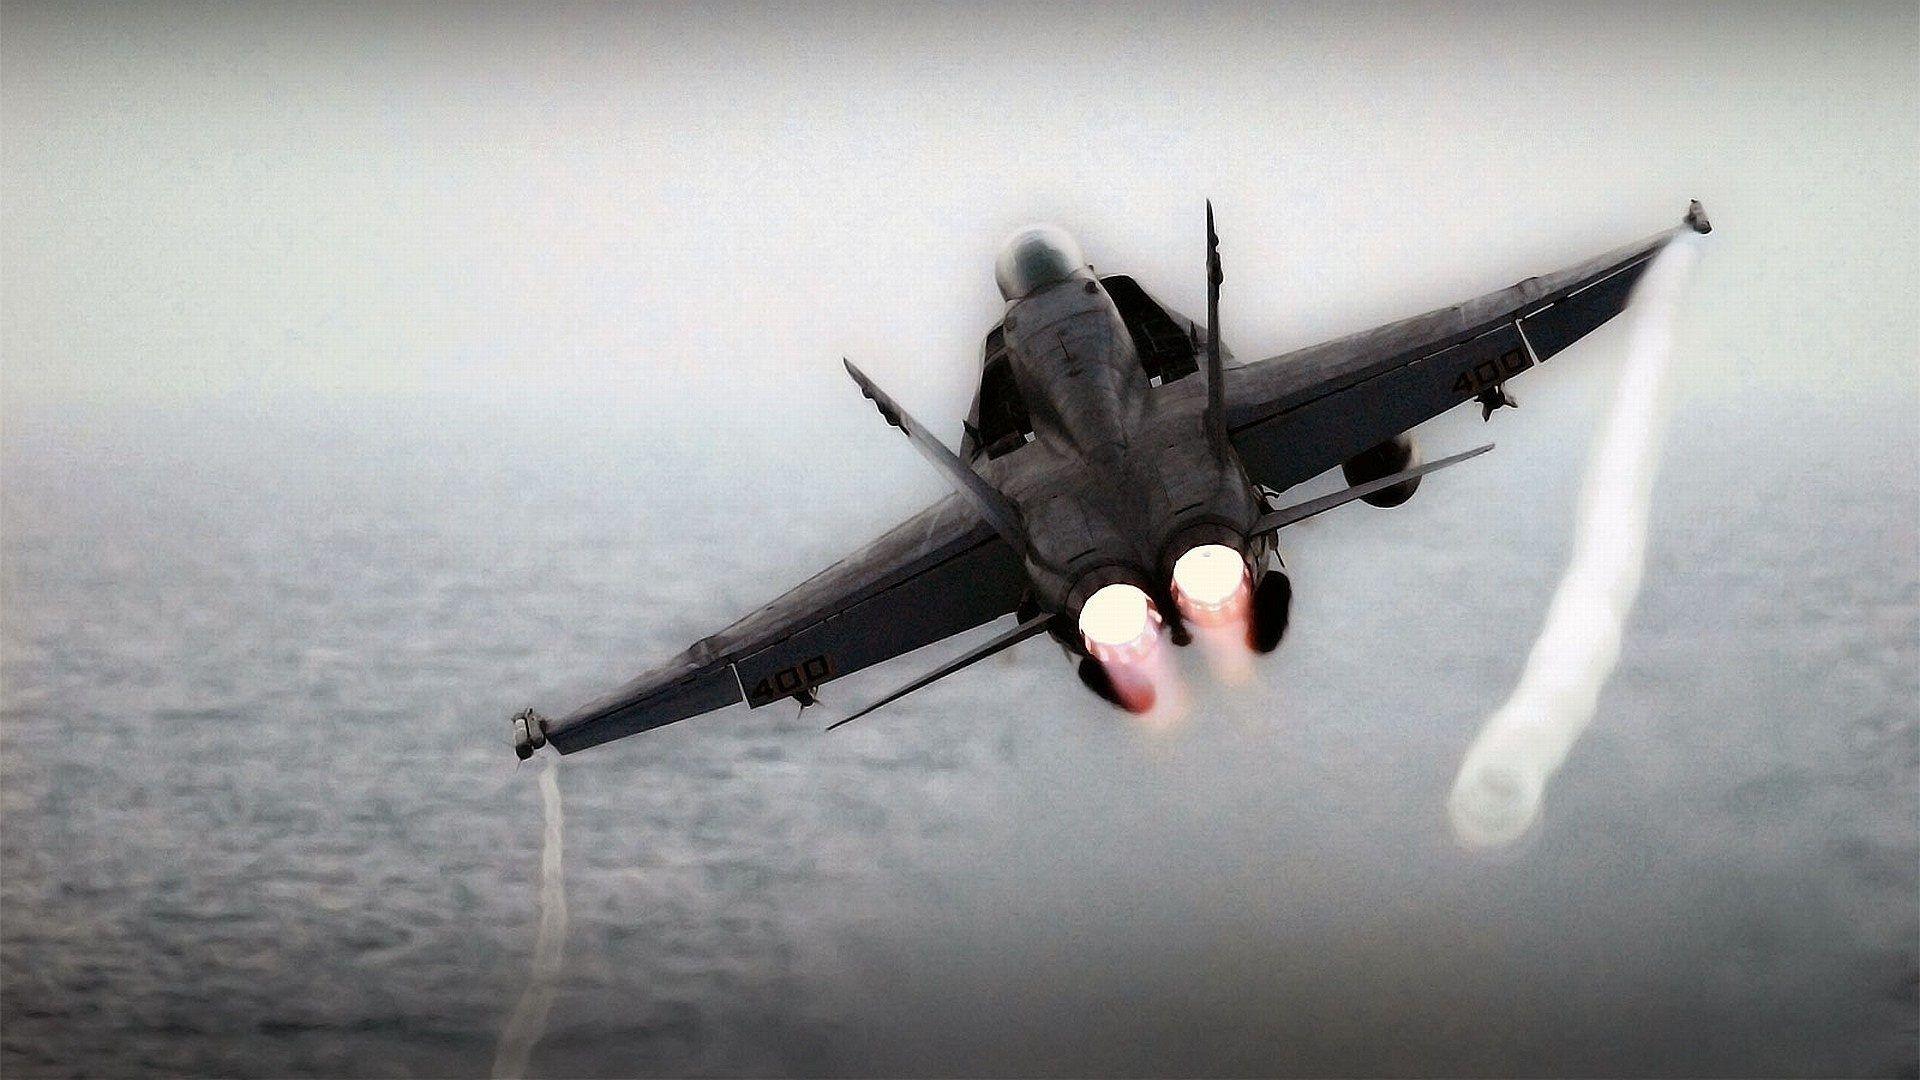 fighter aircraft war plane wallpaper for desktop and mobile